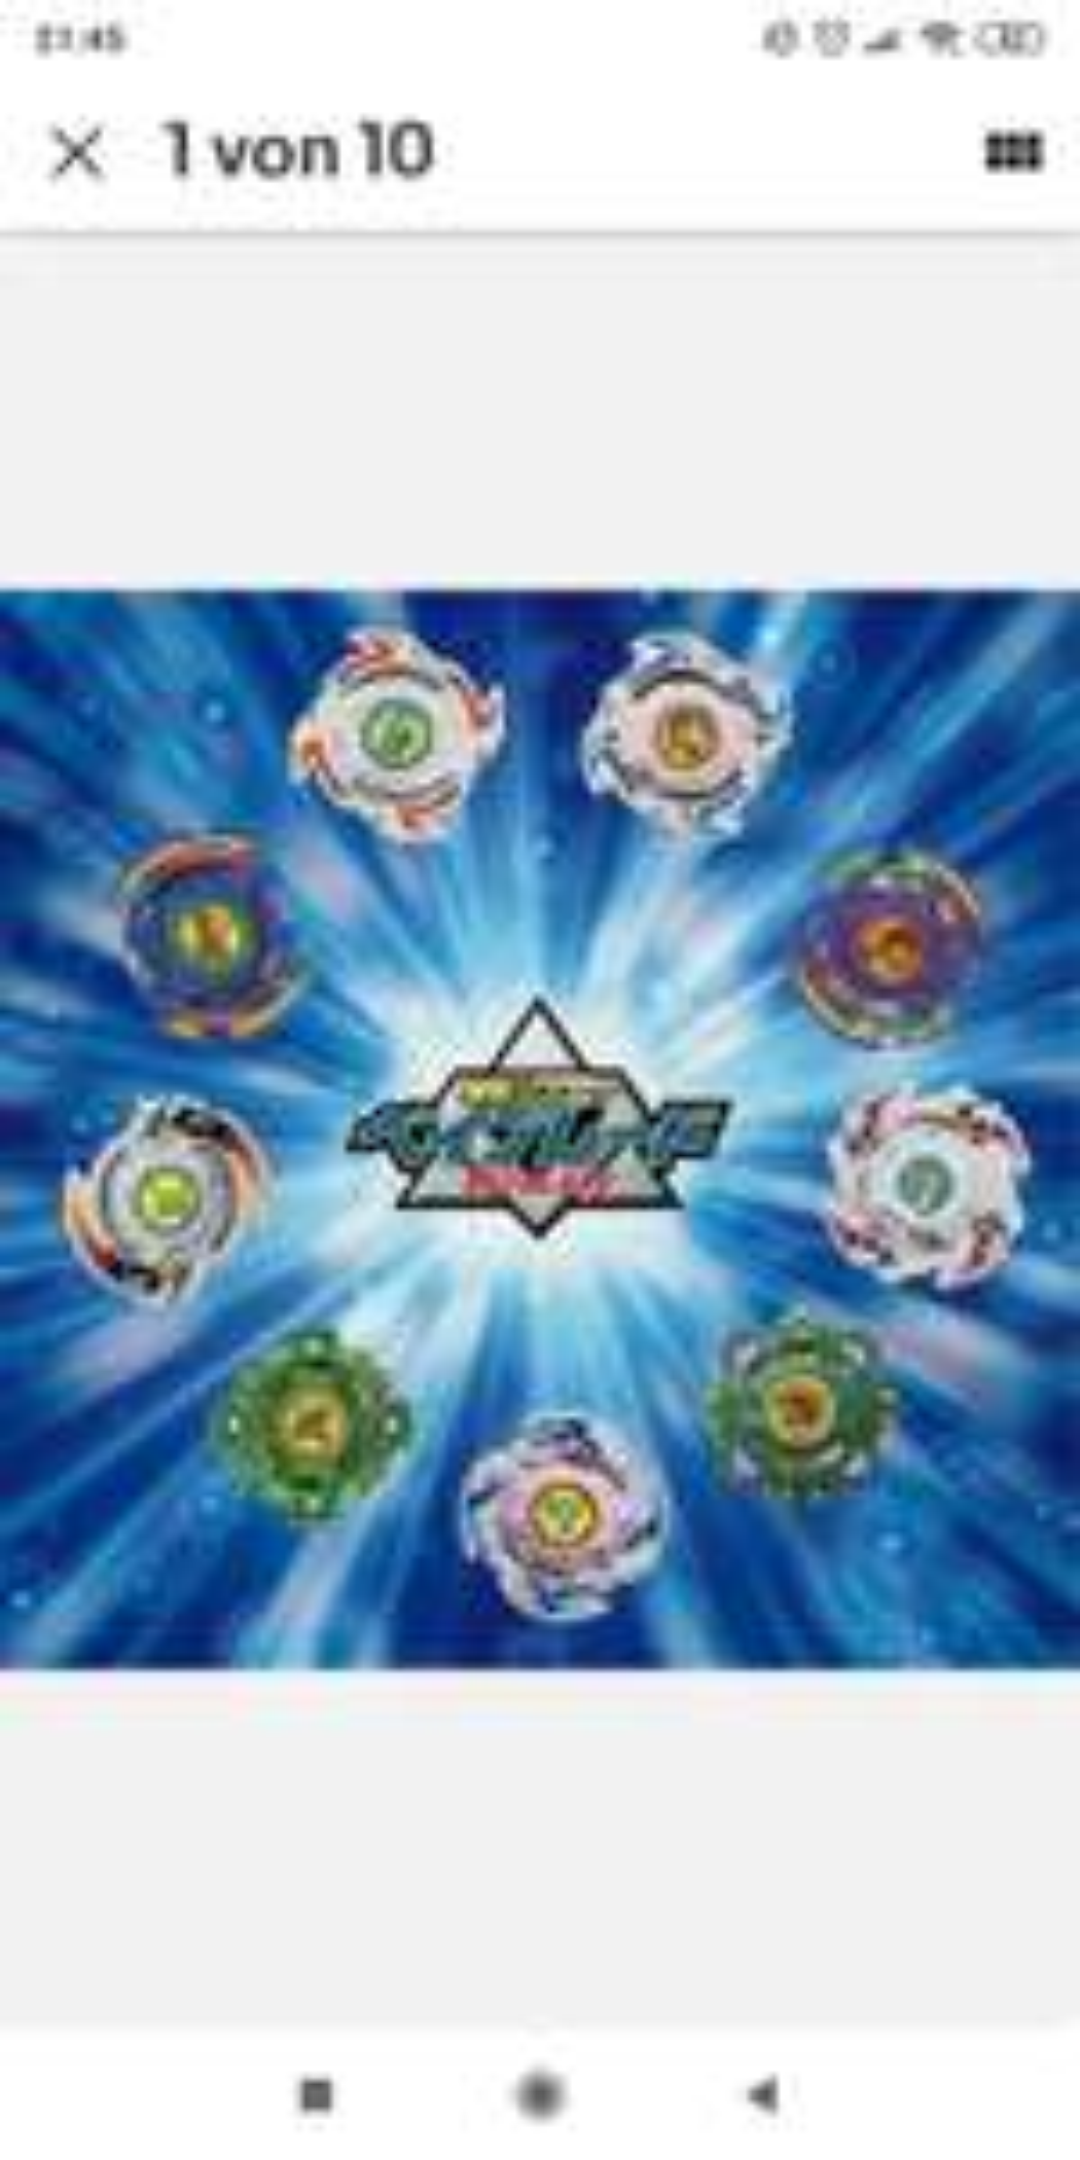 Beyblade 20th Anniversary Set